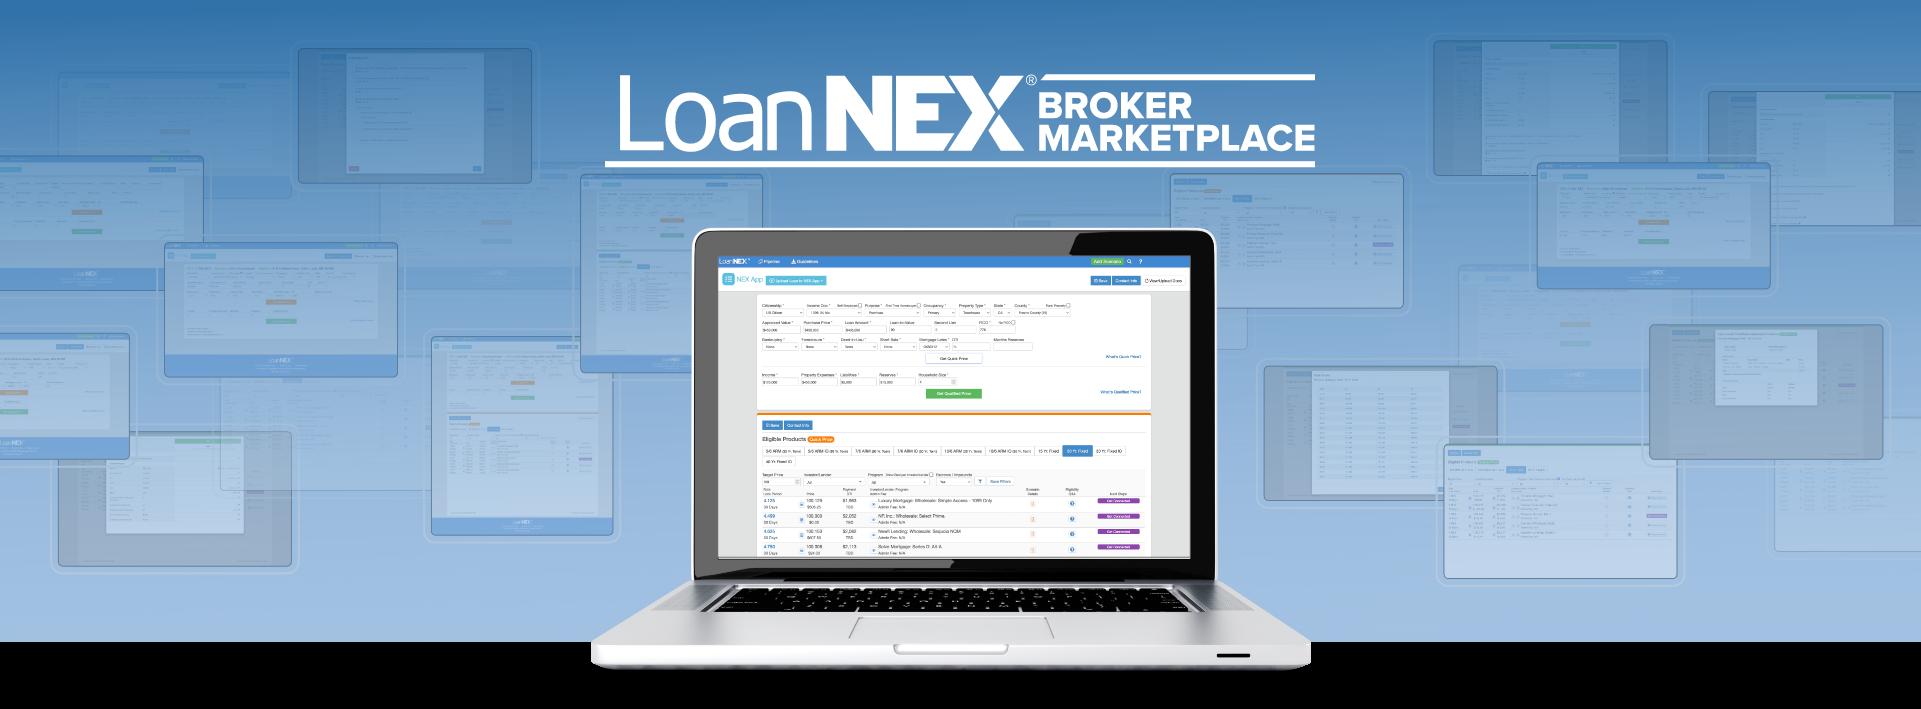 LoanNEX Broker Marketplace Logo with Platform Displaying on Desktop Computer